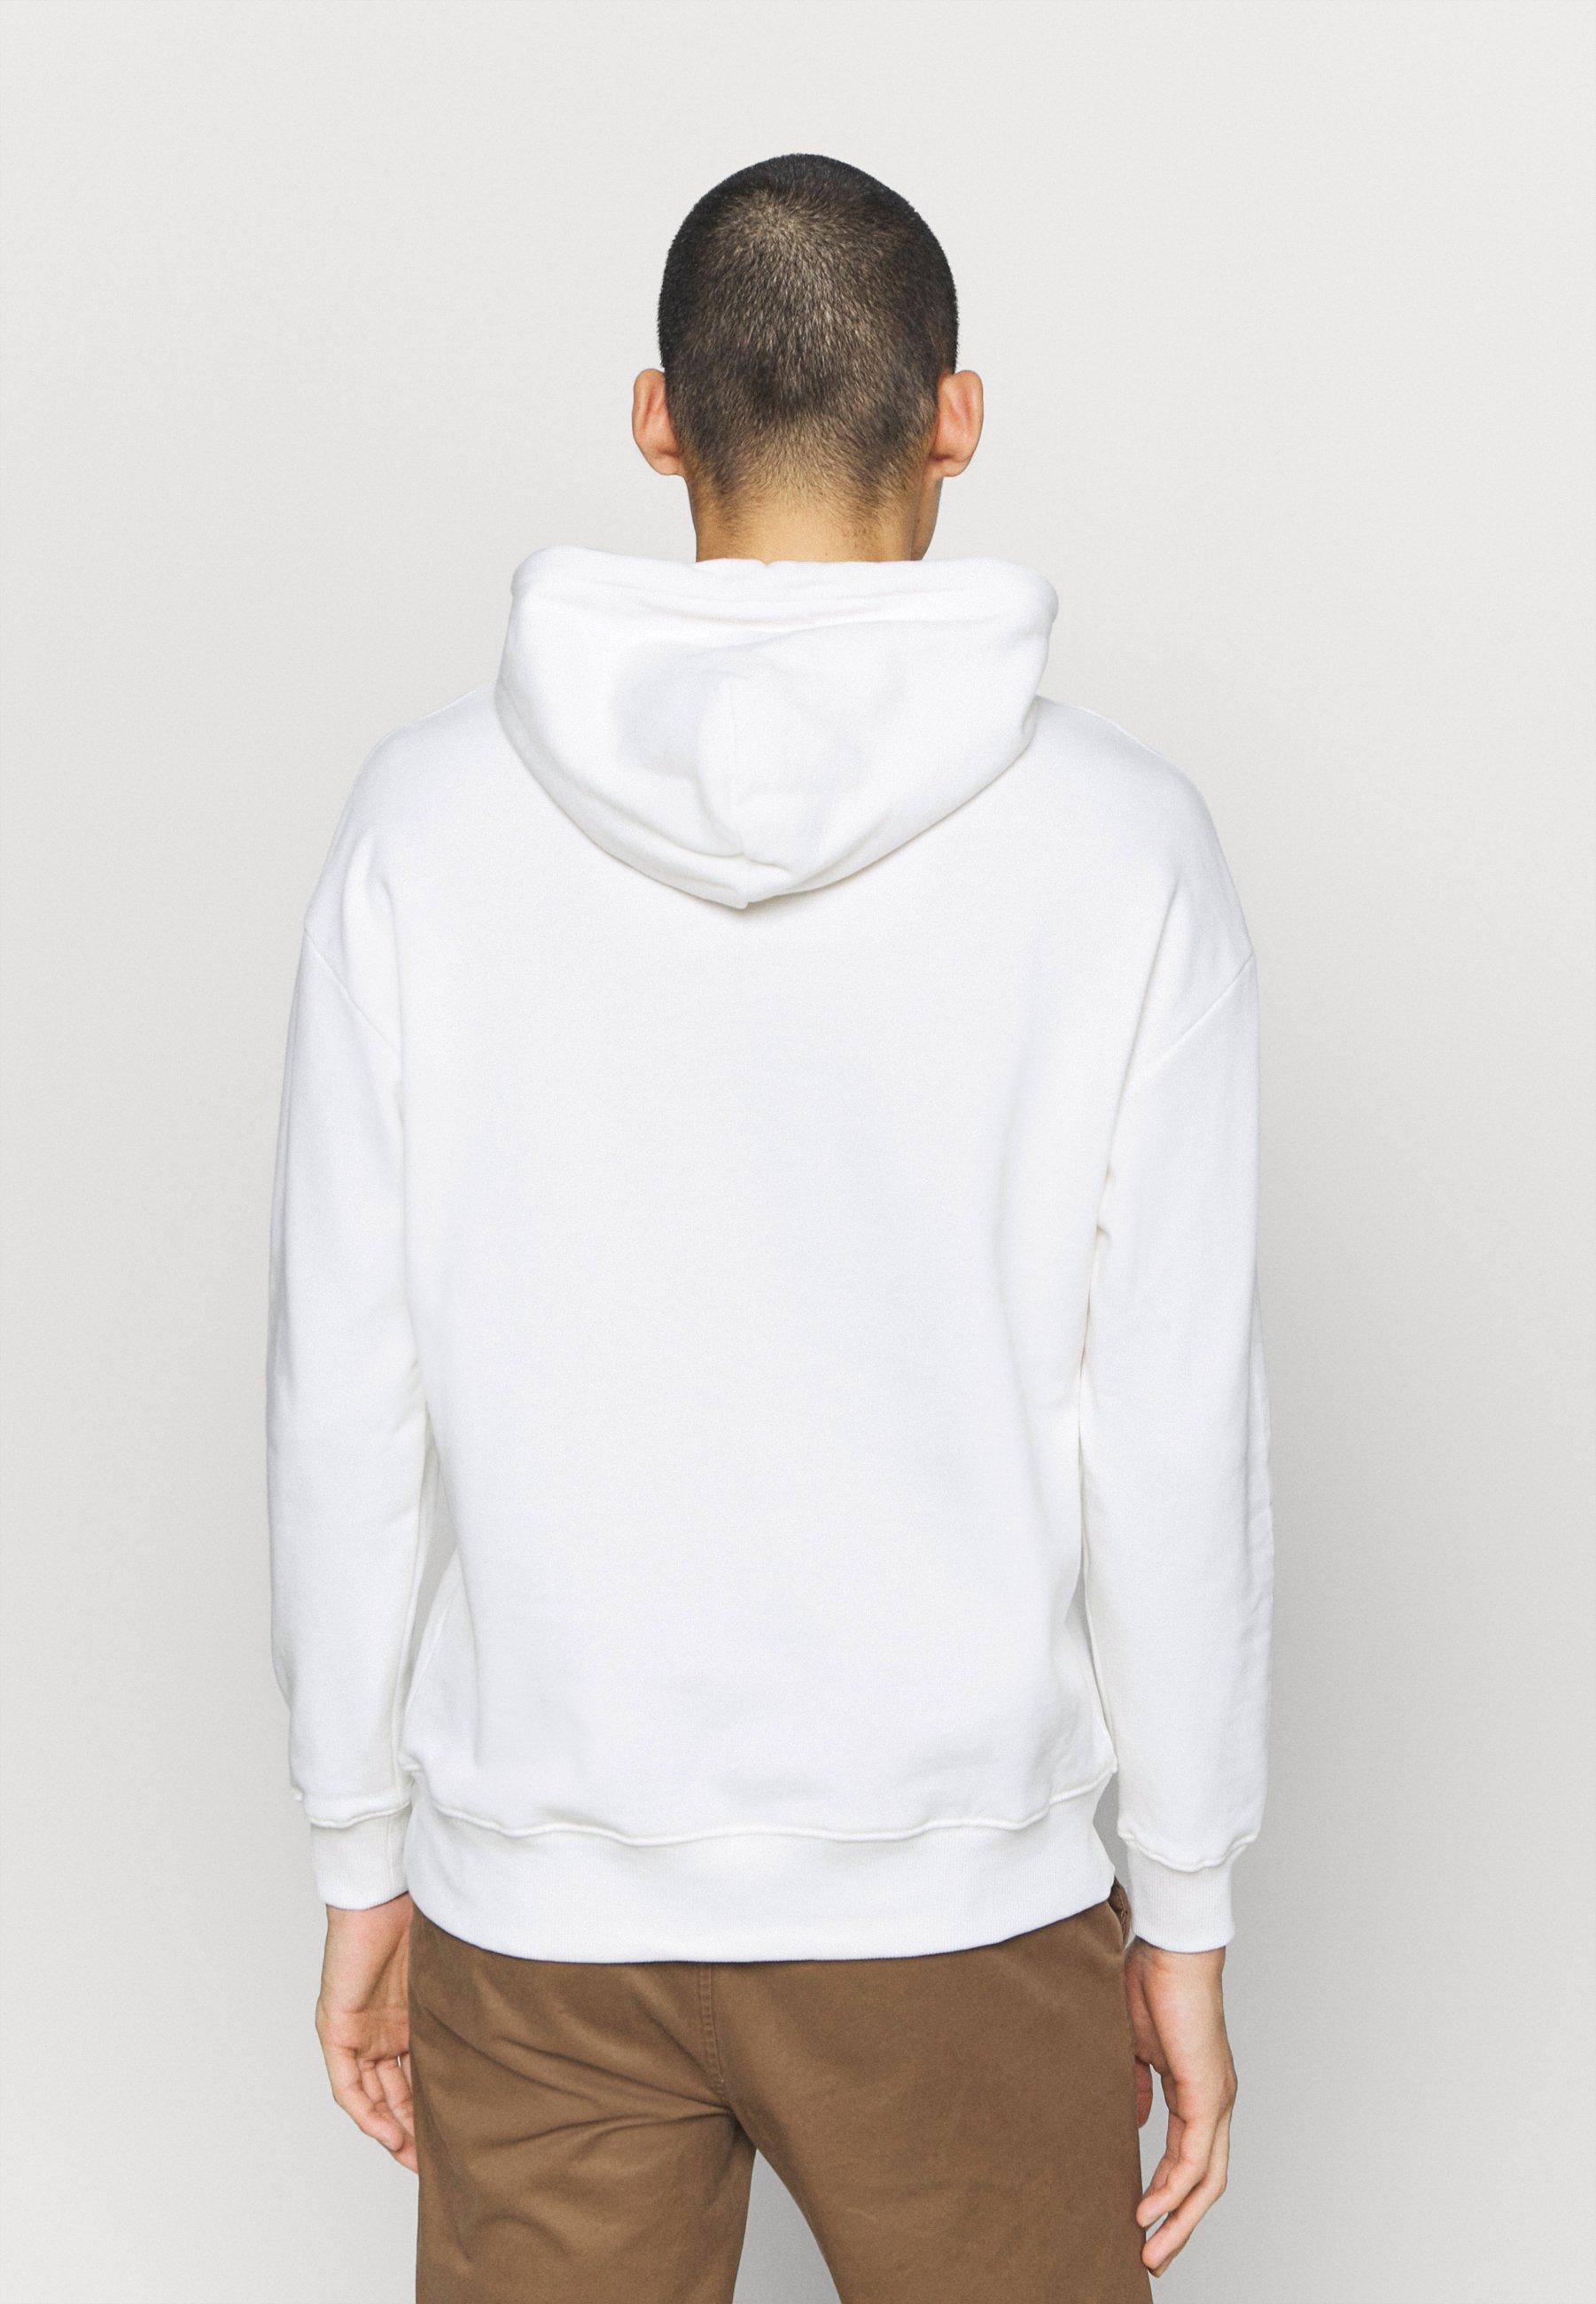 2020 Newest Latest Discount Women's Clothing Lee PRIDE  Hoodie white canvas E2RXsztjO 3RBixMBpS